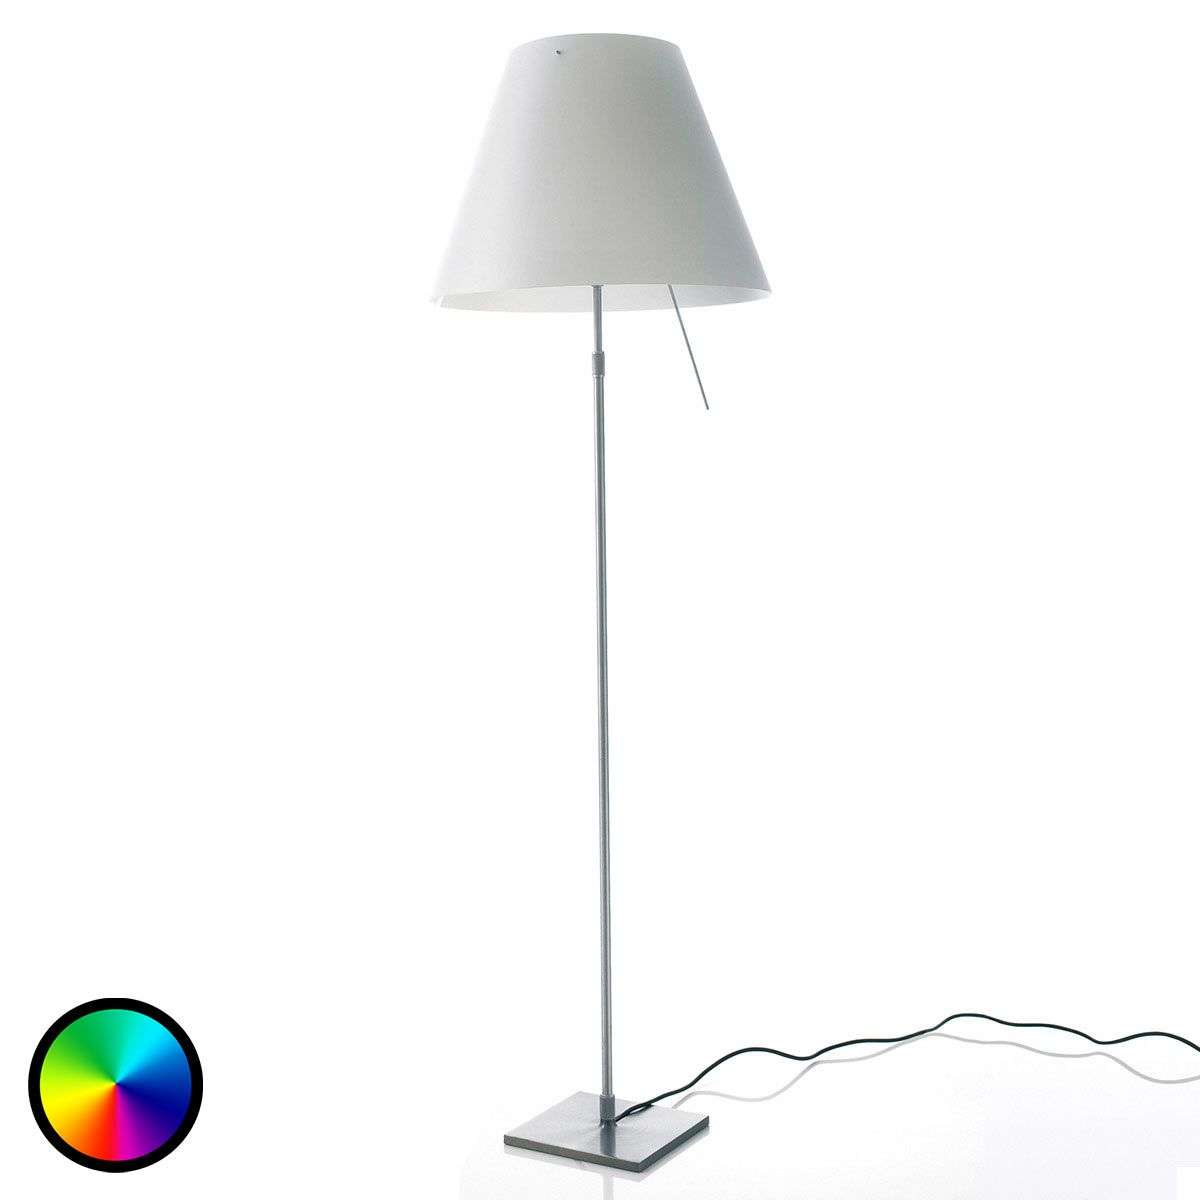 Philips hue led floor lamp constanza adjustable lights philips hue led floor lamp constanza adjustable 6030167 31 aloadofball Images